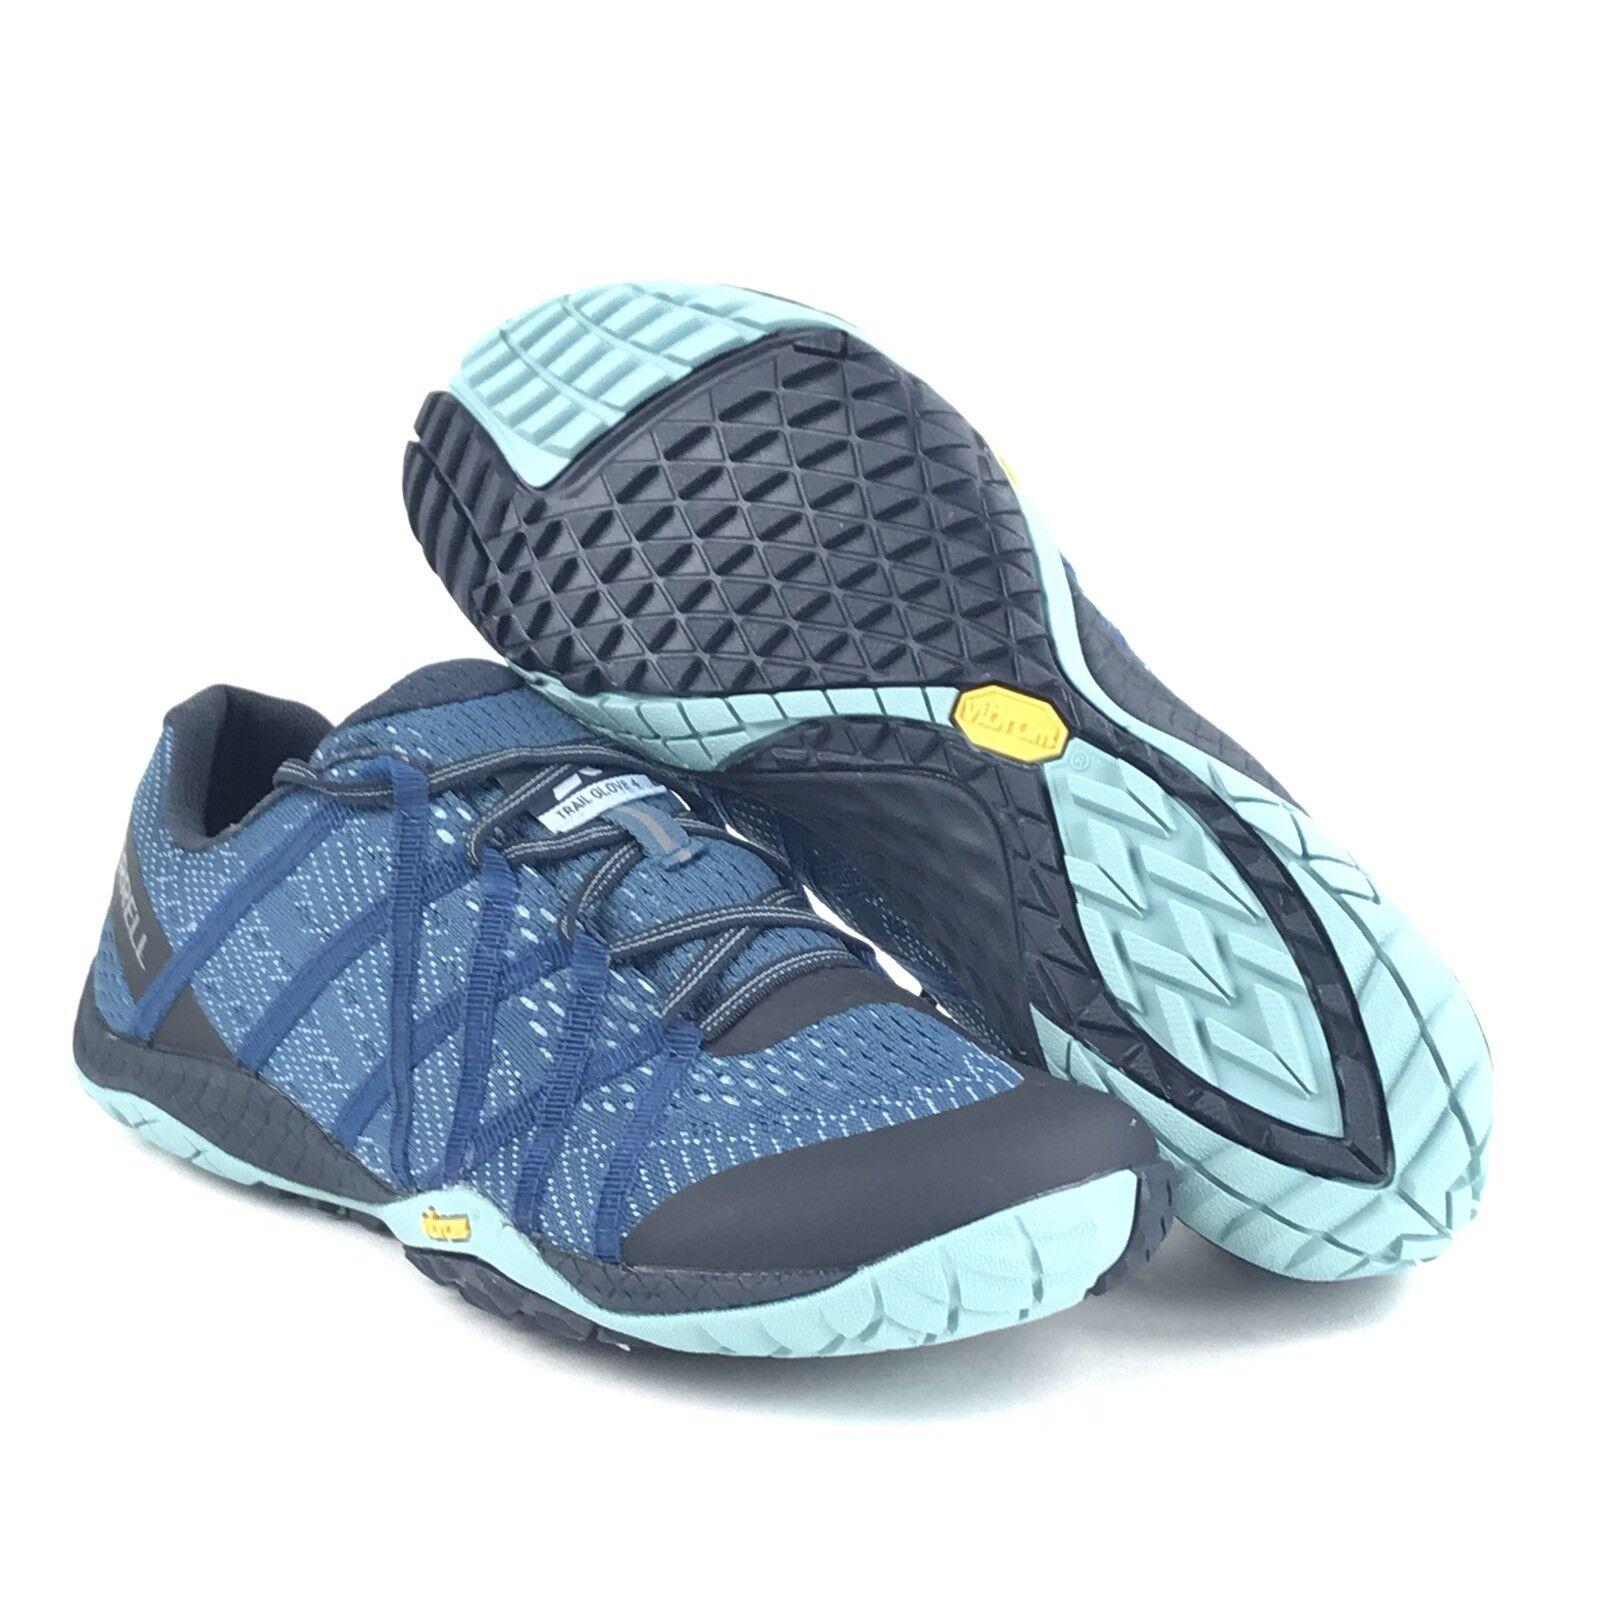 Merrell damen Trail Glove 4E Aqua Mesh Running schuhe Größe 7